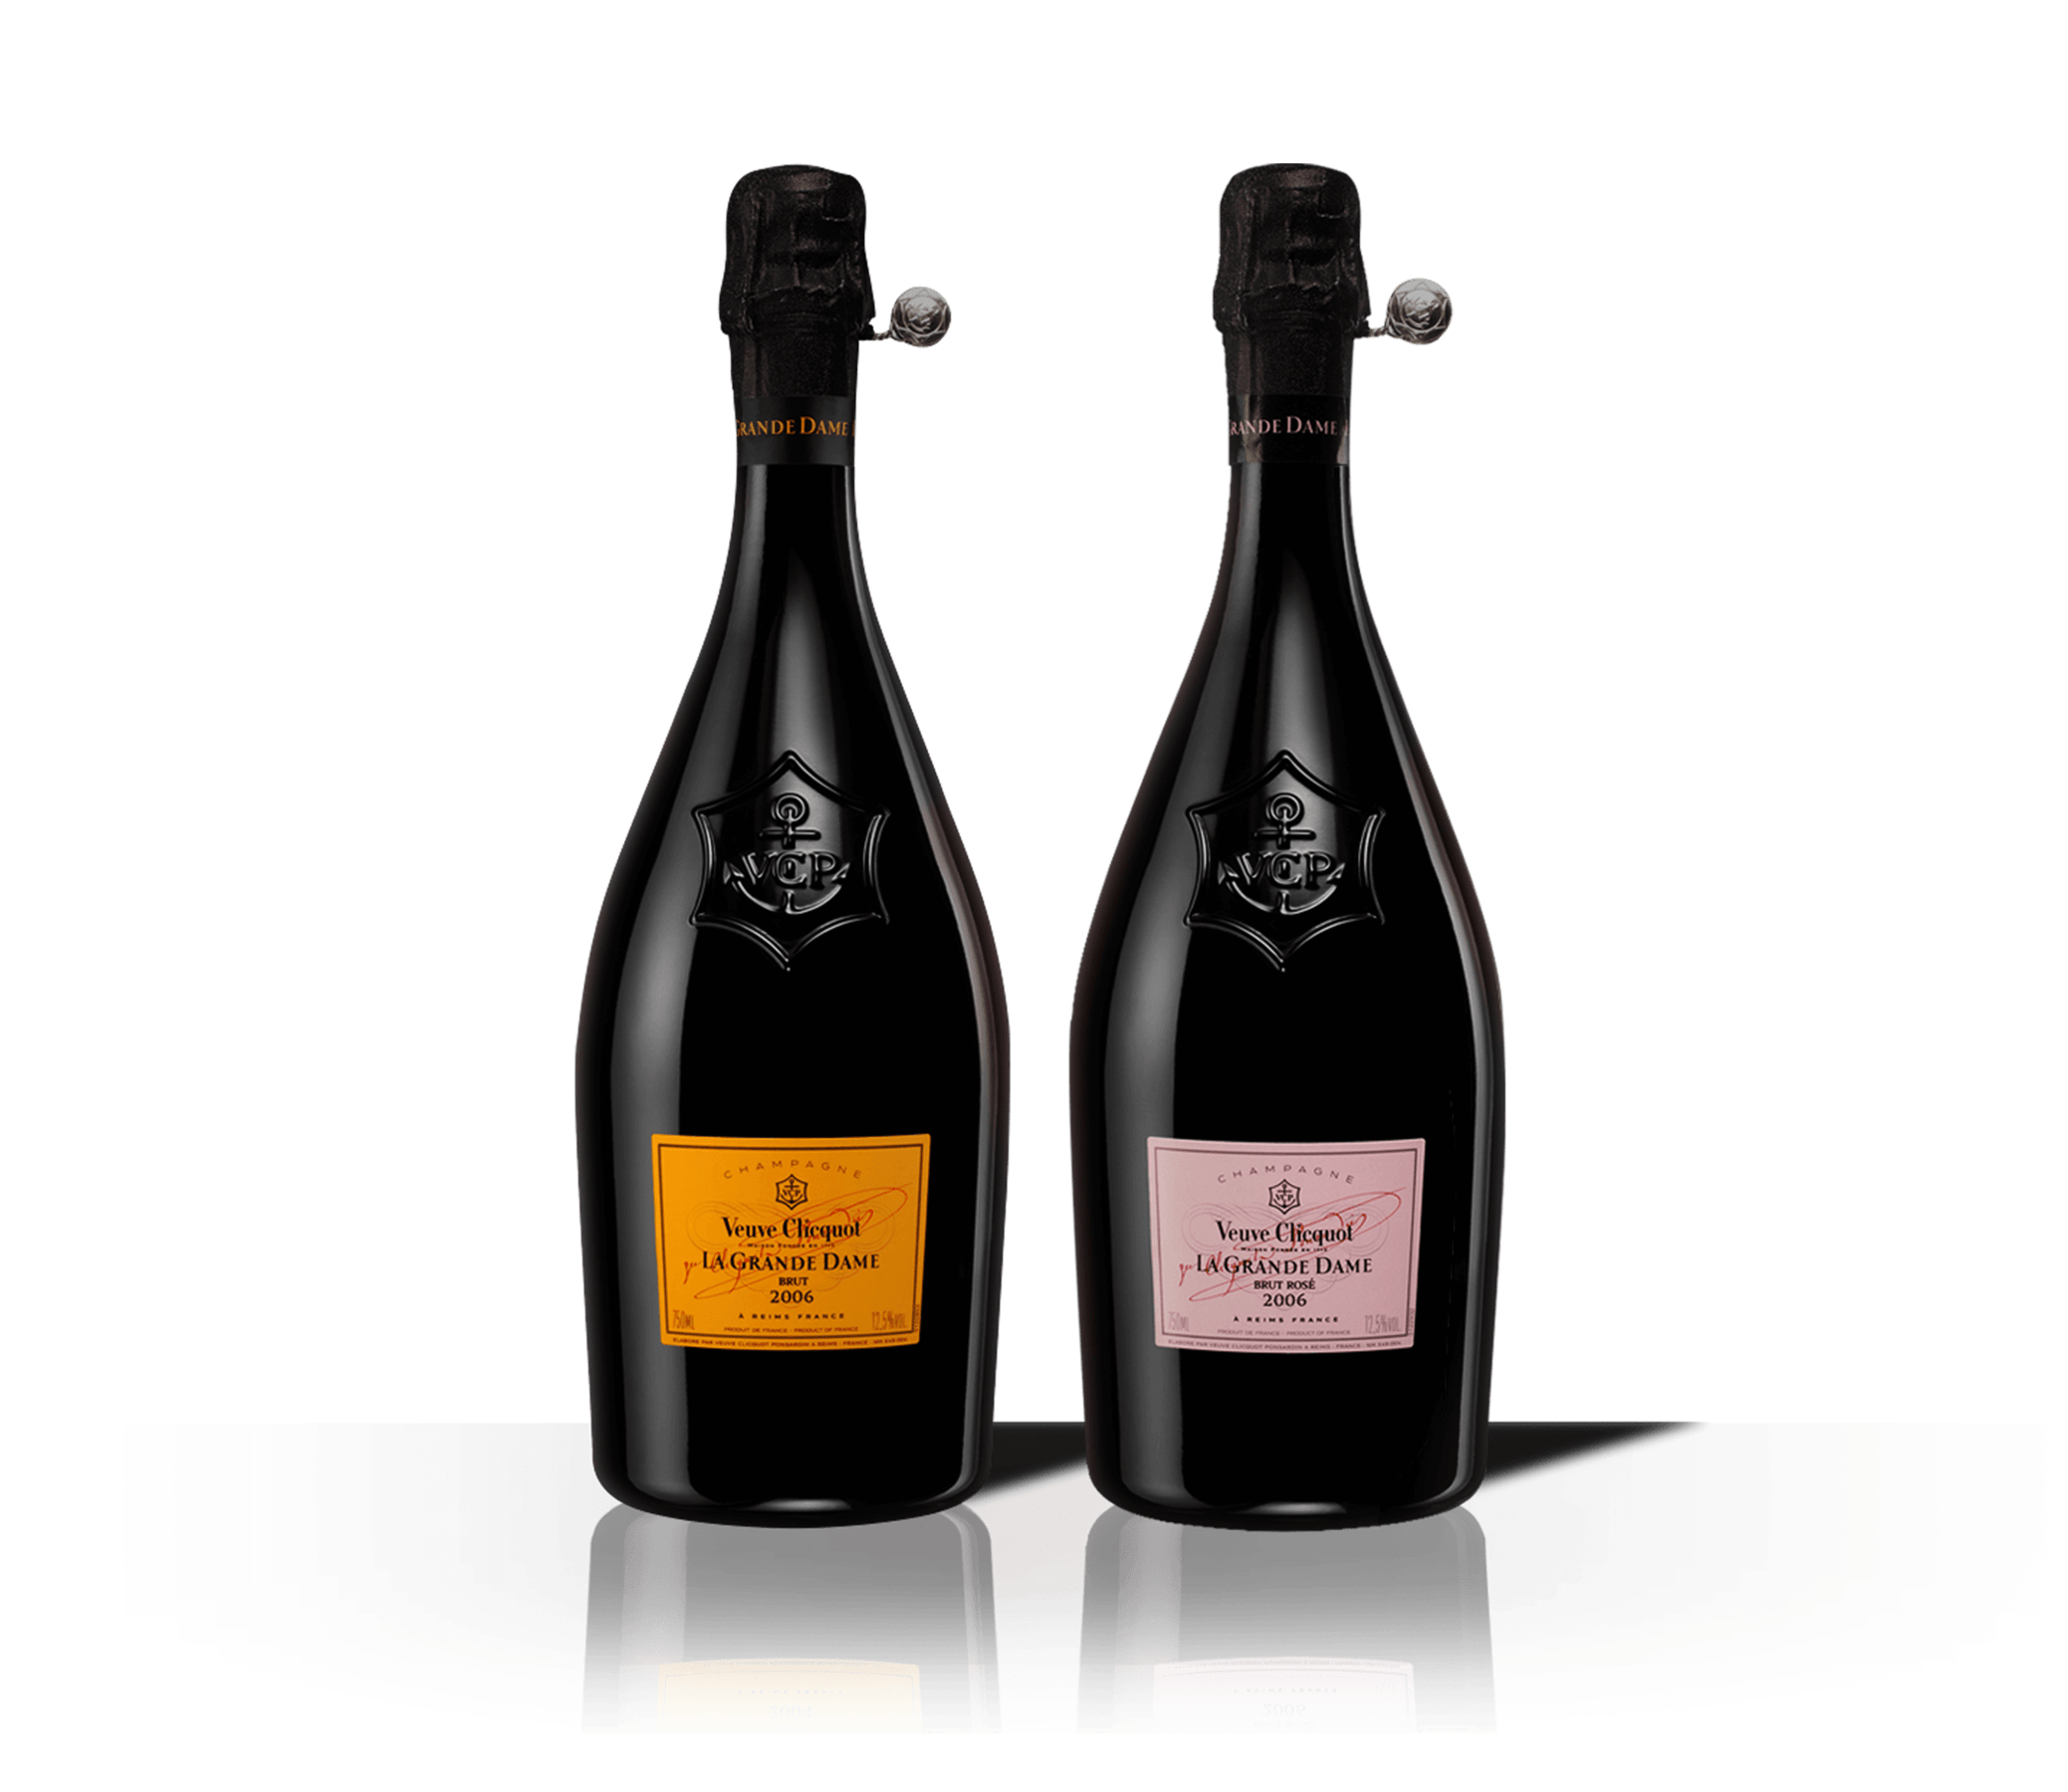 Бутылки шампанского Veuve Clicquot La Grande Dame 2008